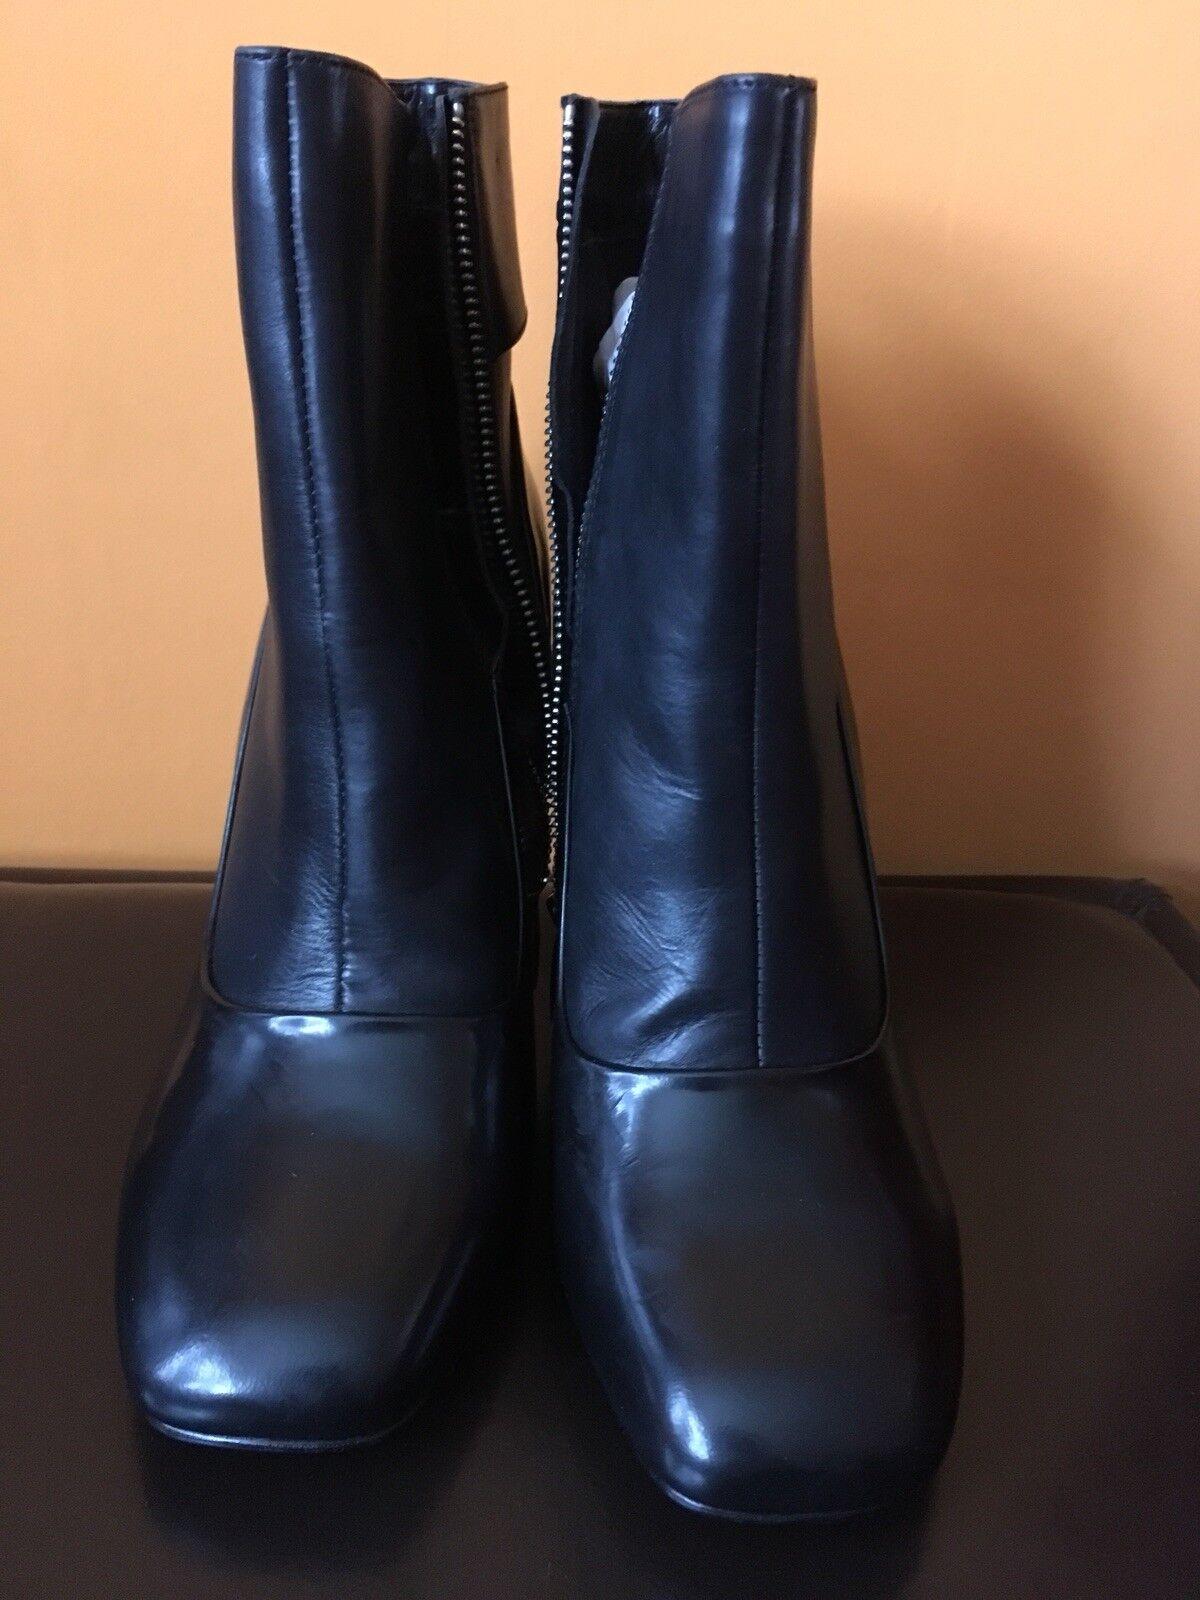 Karen Millen Black Boots size 41 8 - NEW IN BOX